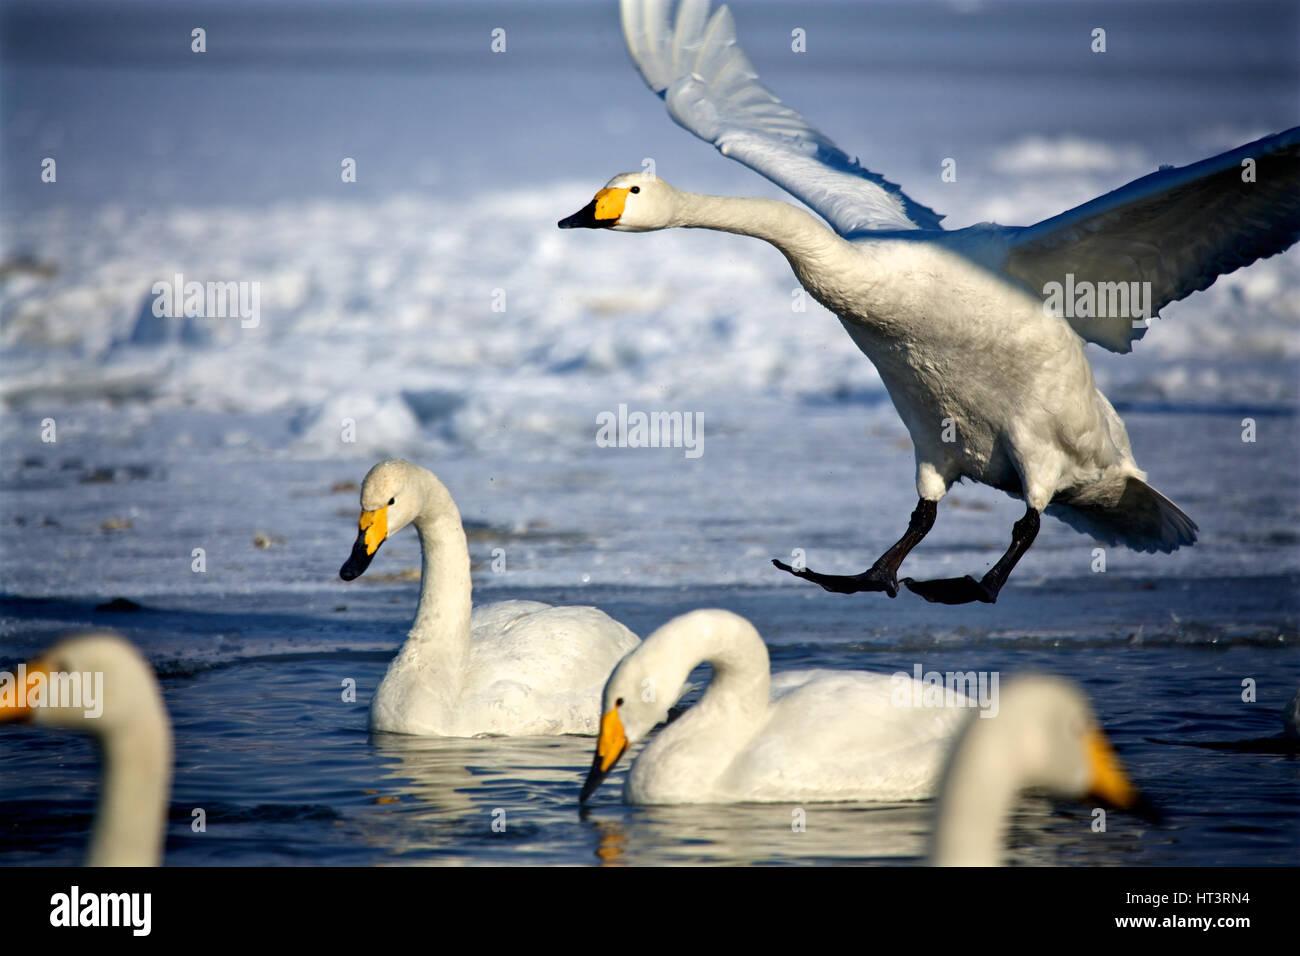 Whooper swans (Cygnus cygnus) in Lake Kussharo, Hokkaido, Japan - Stock Image